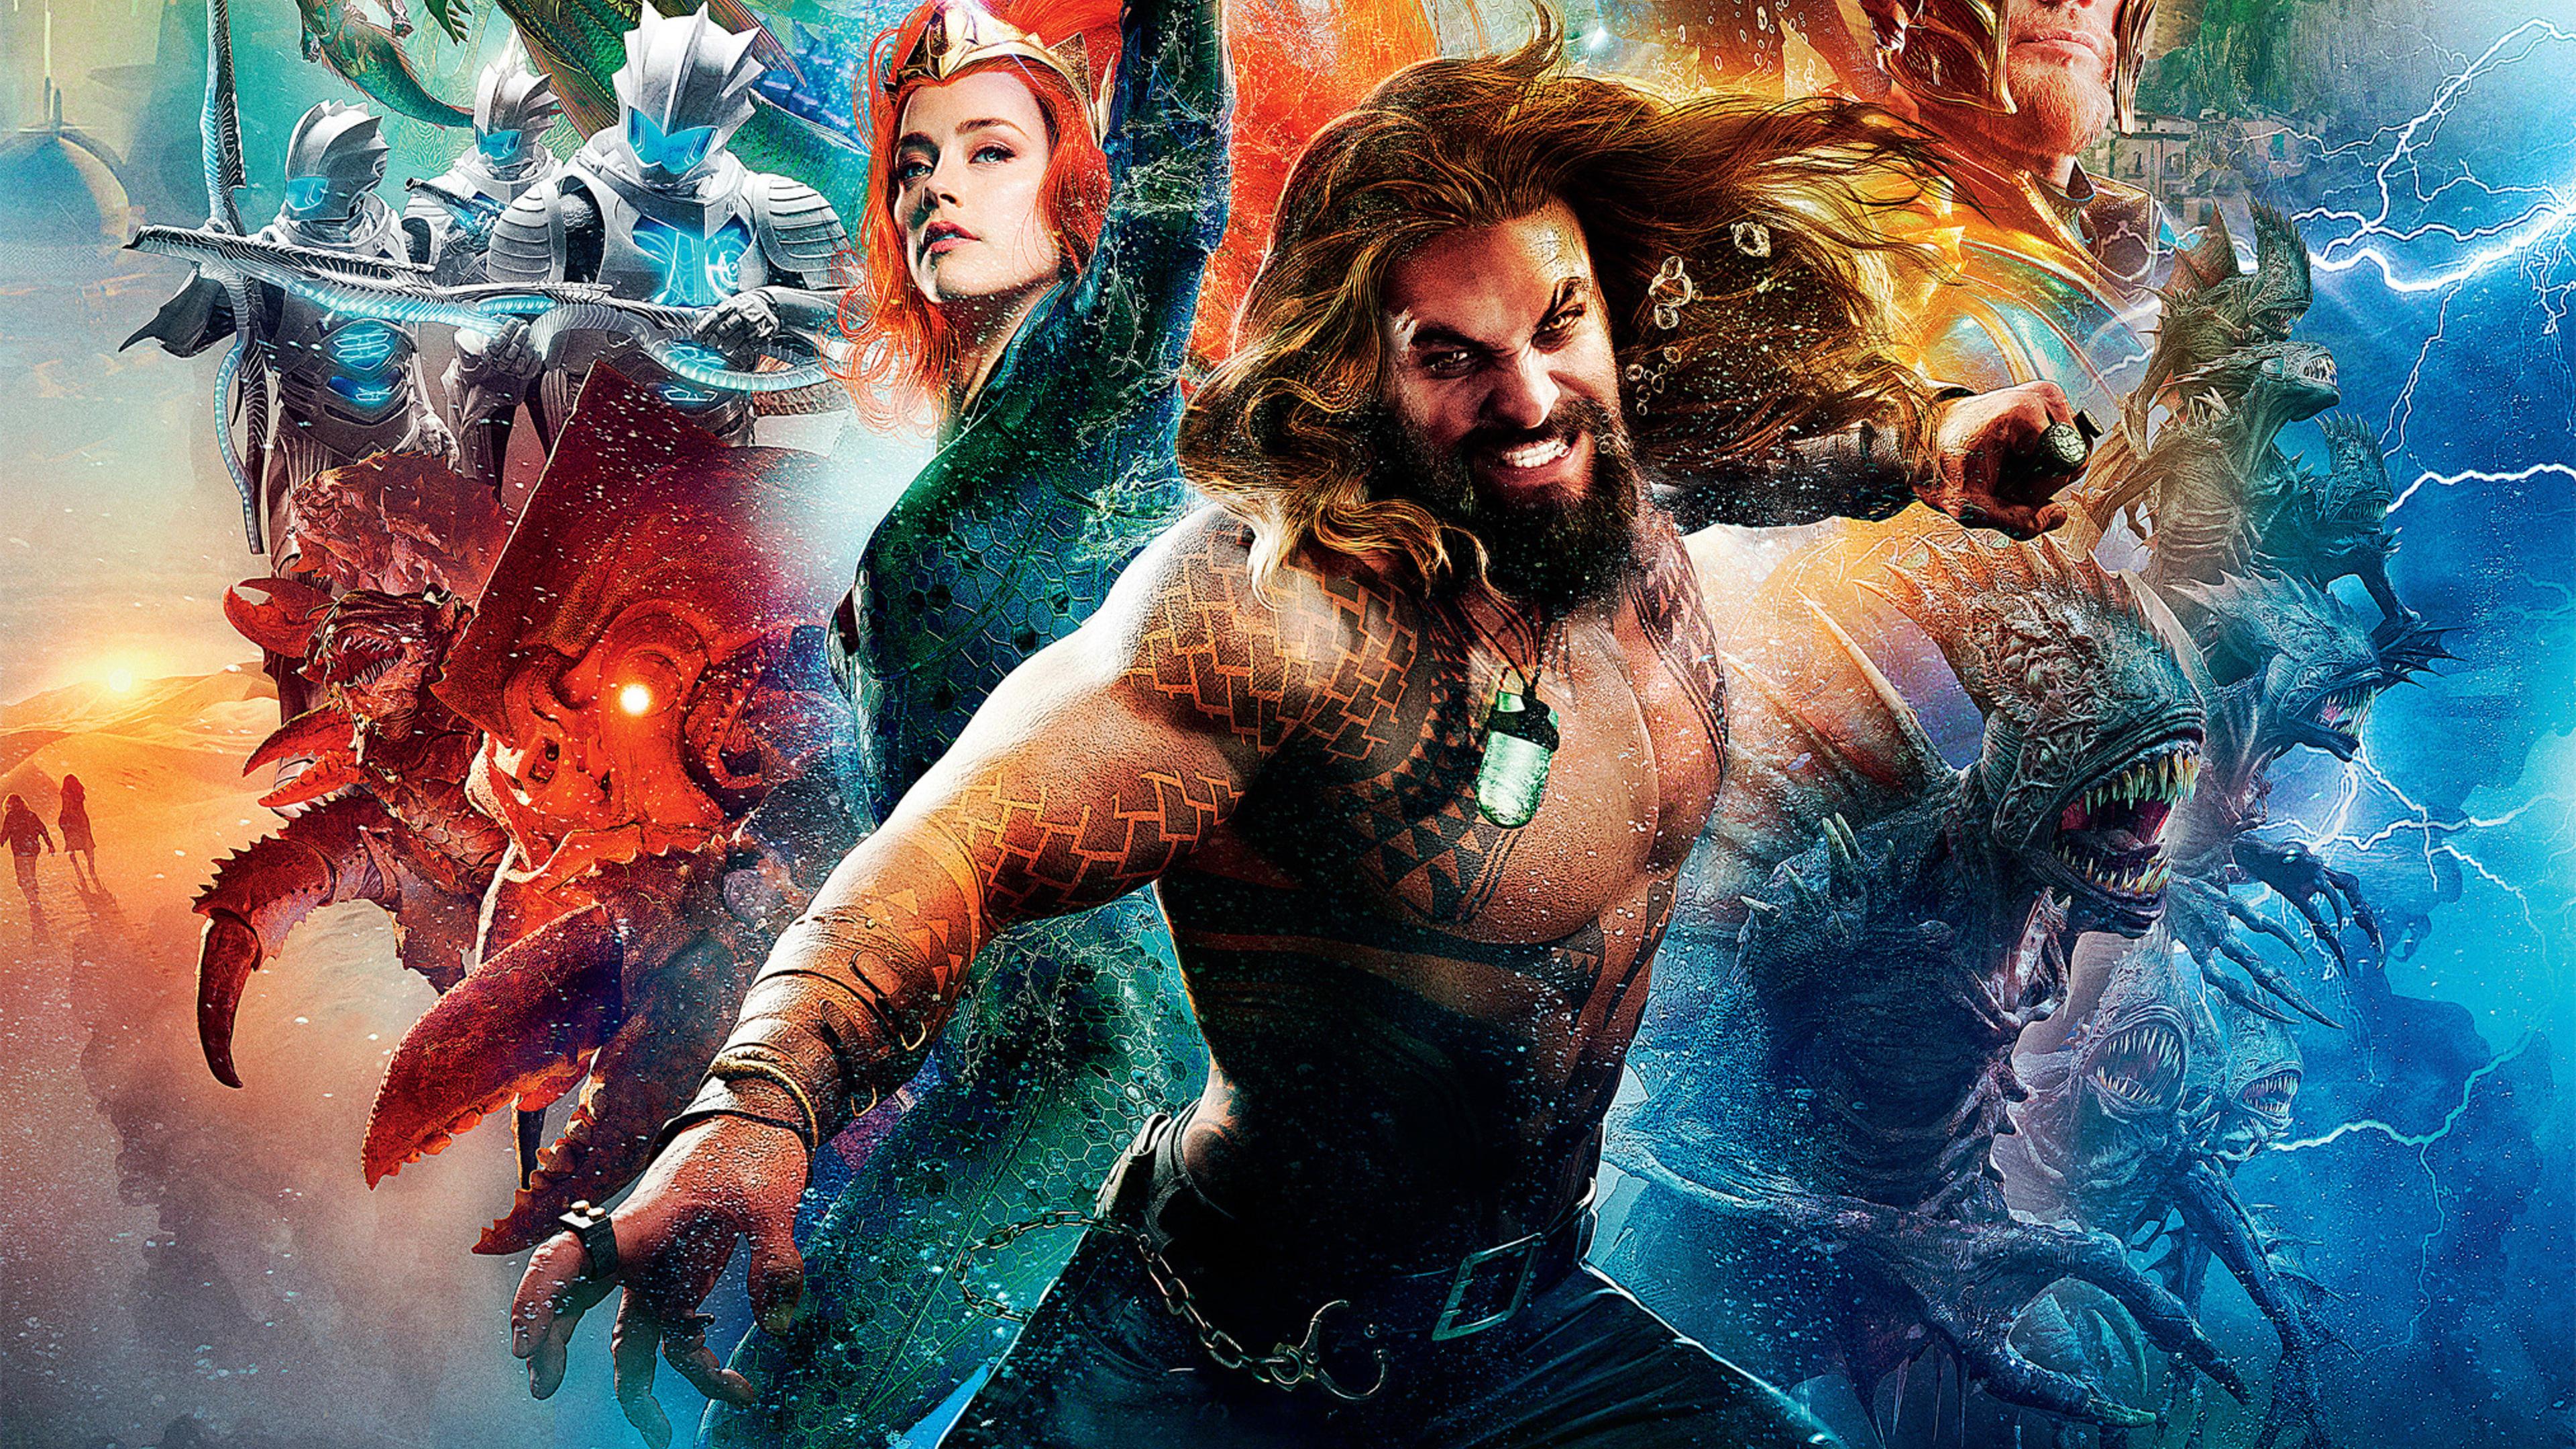 Aquaman 4k Ultra Hd Wallpaper Background Image 3840x2160 Id